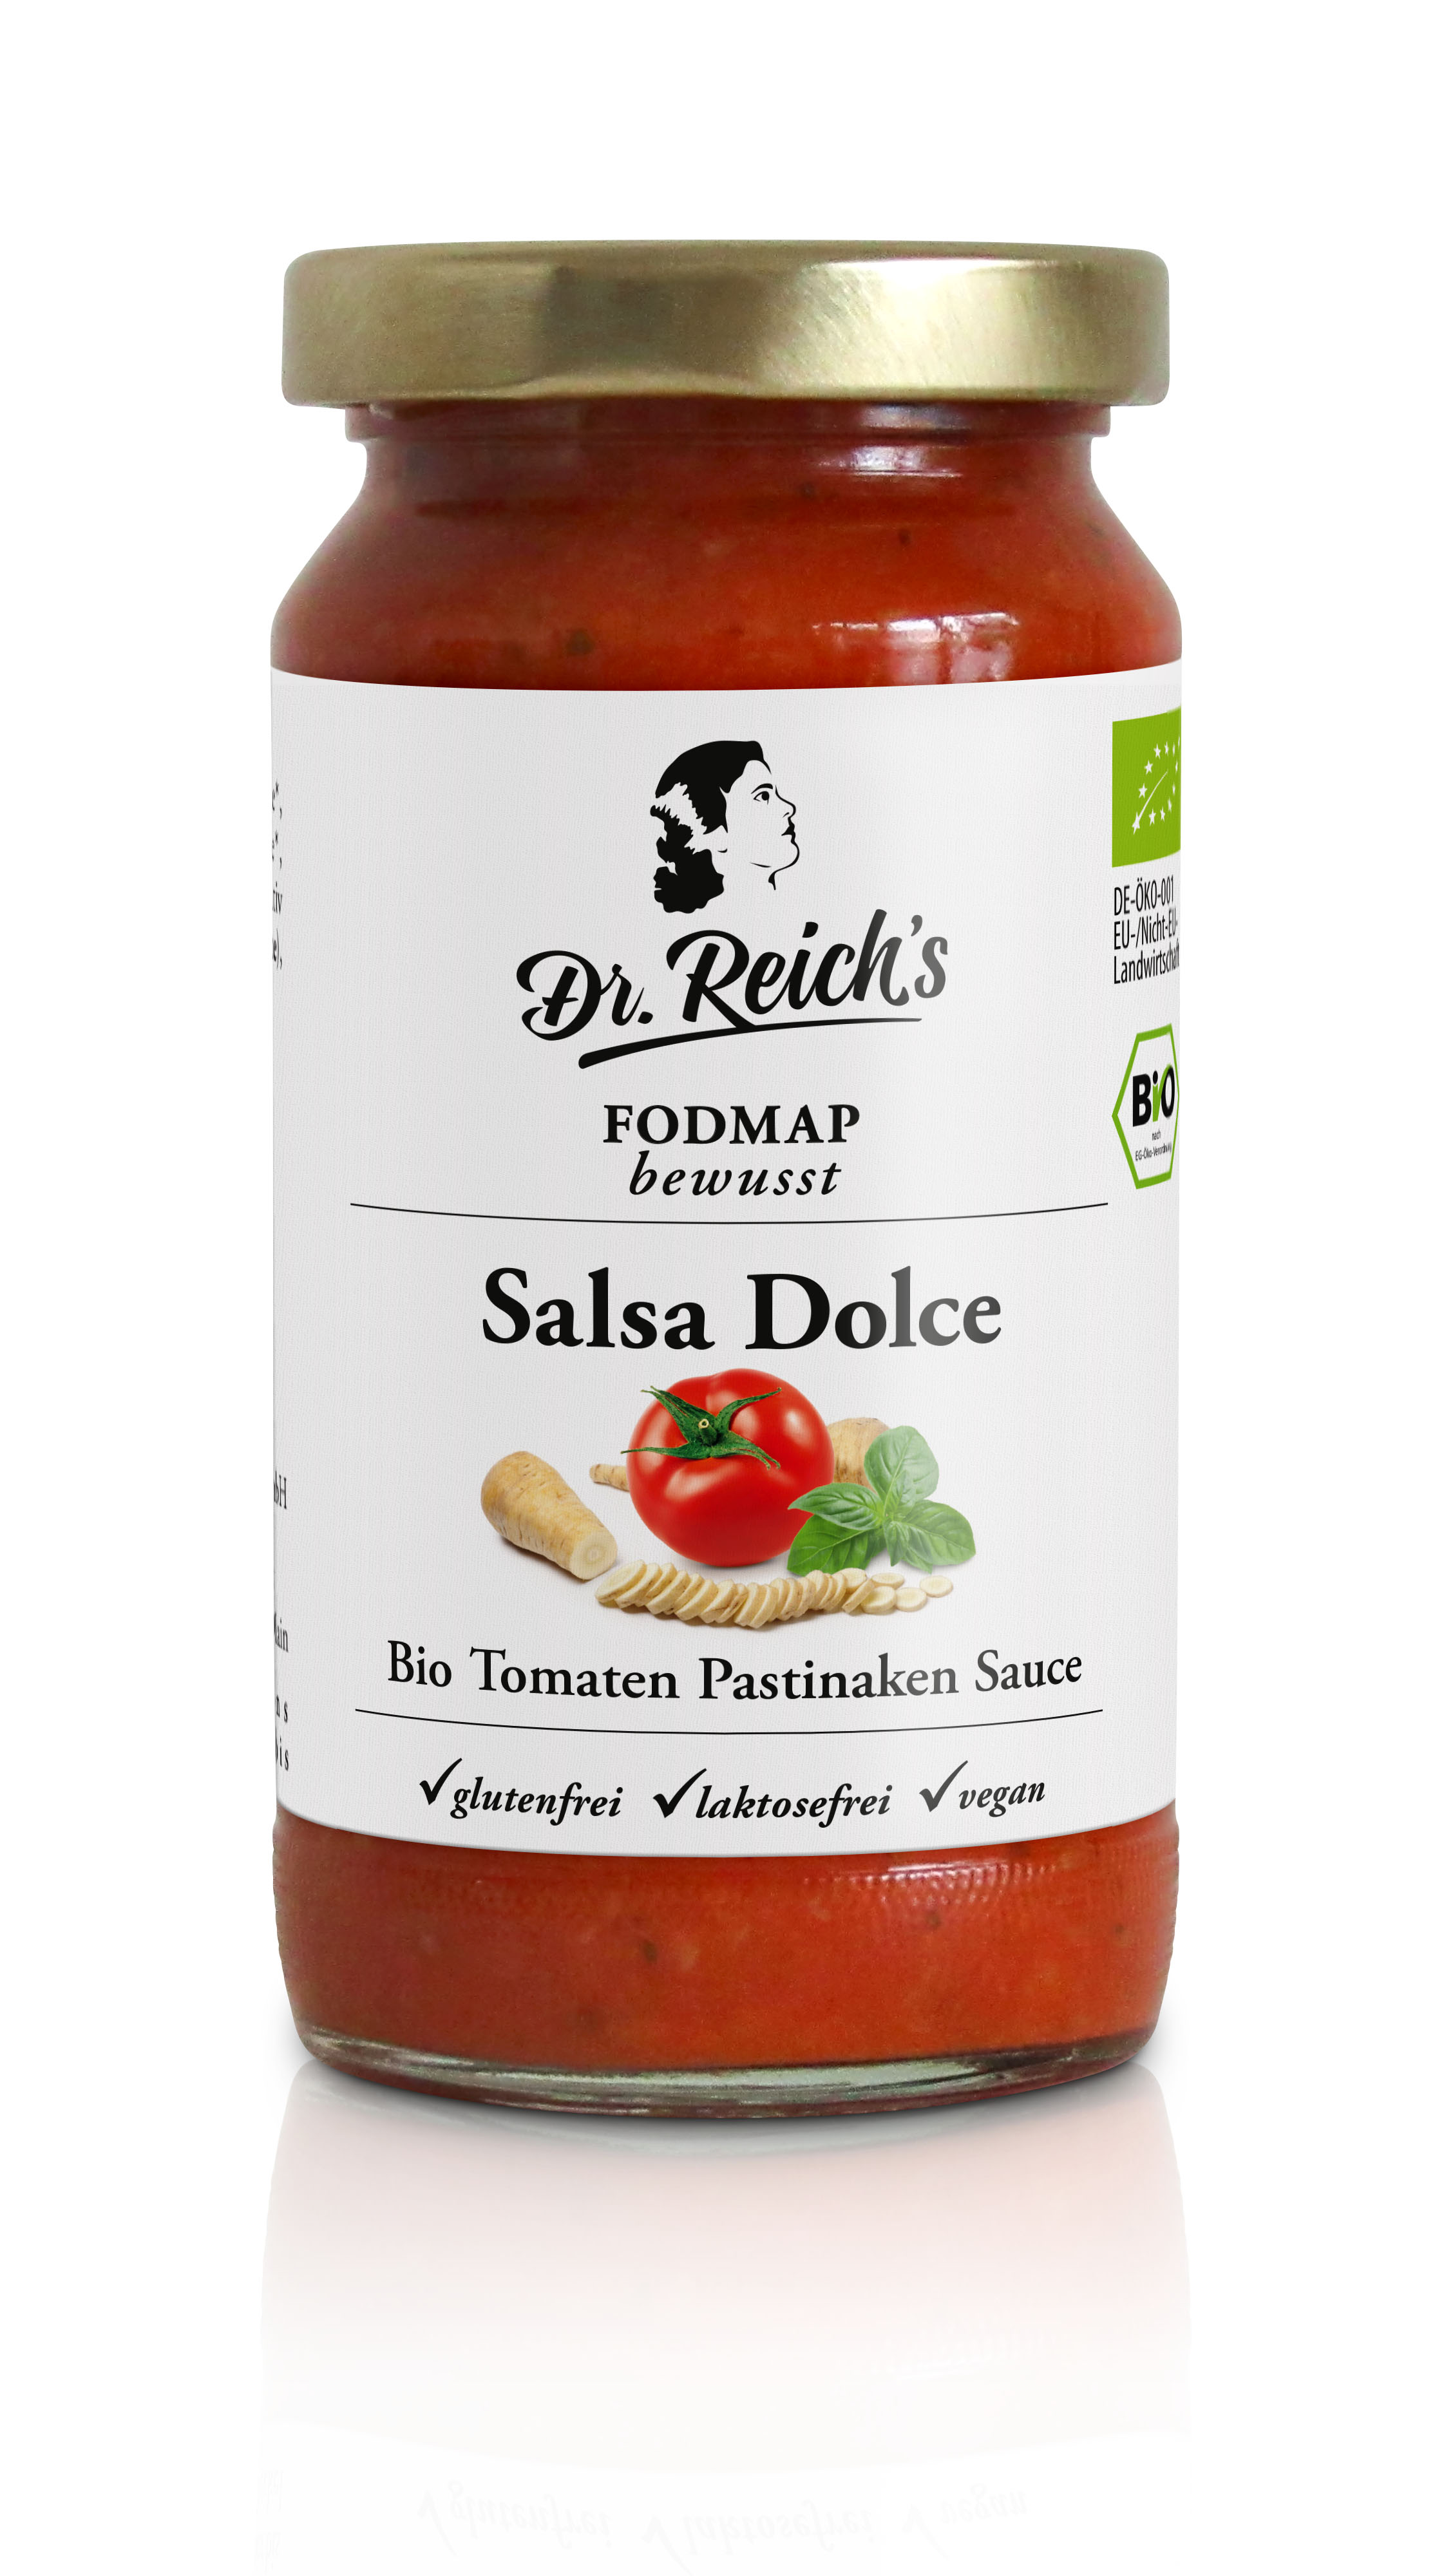 Dr Reichs Salsa Dolce FODMAP Sauce